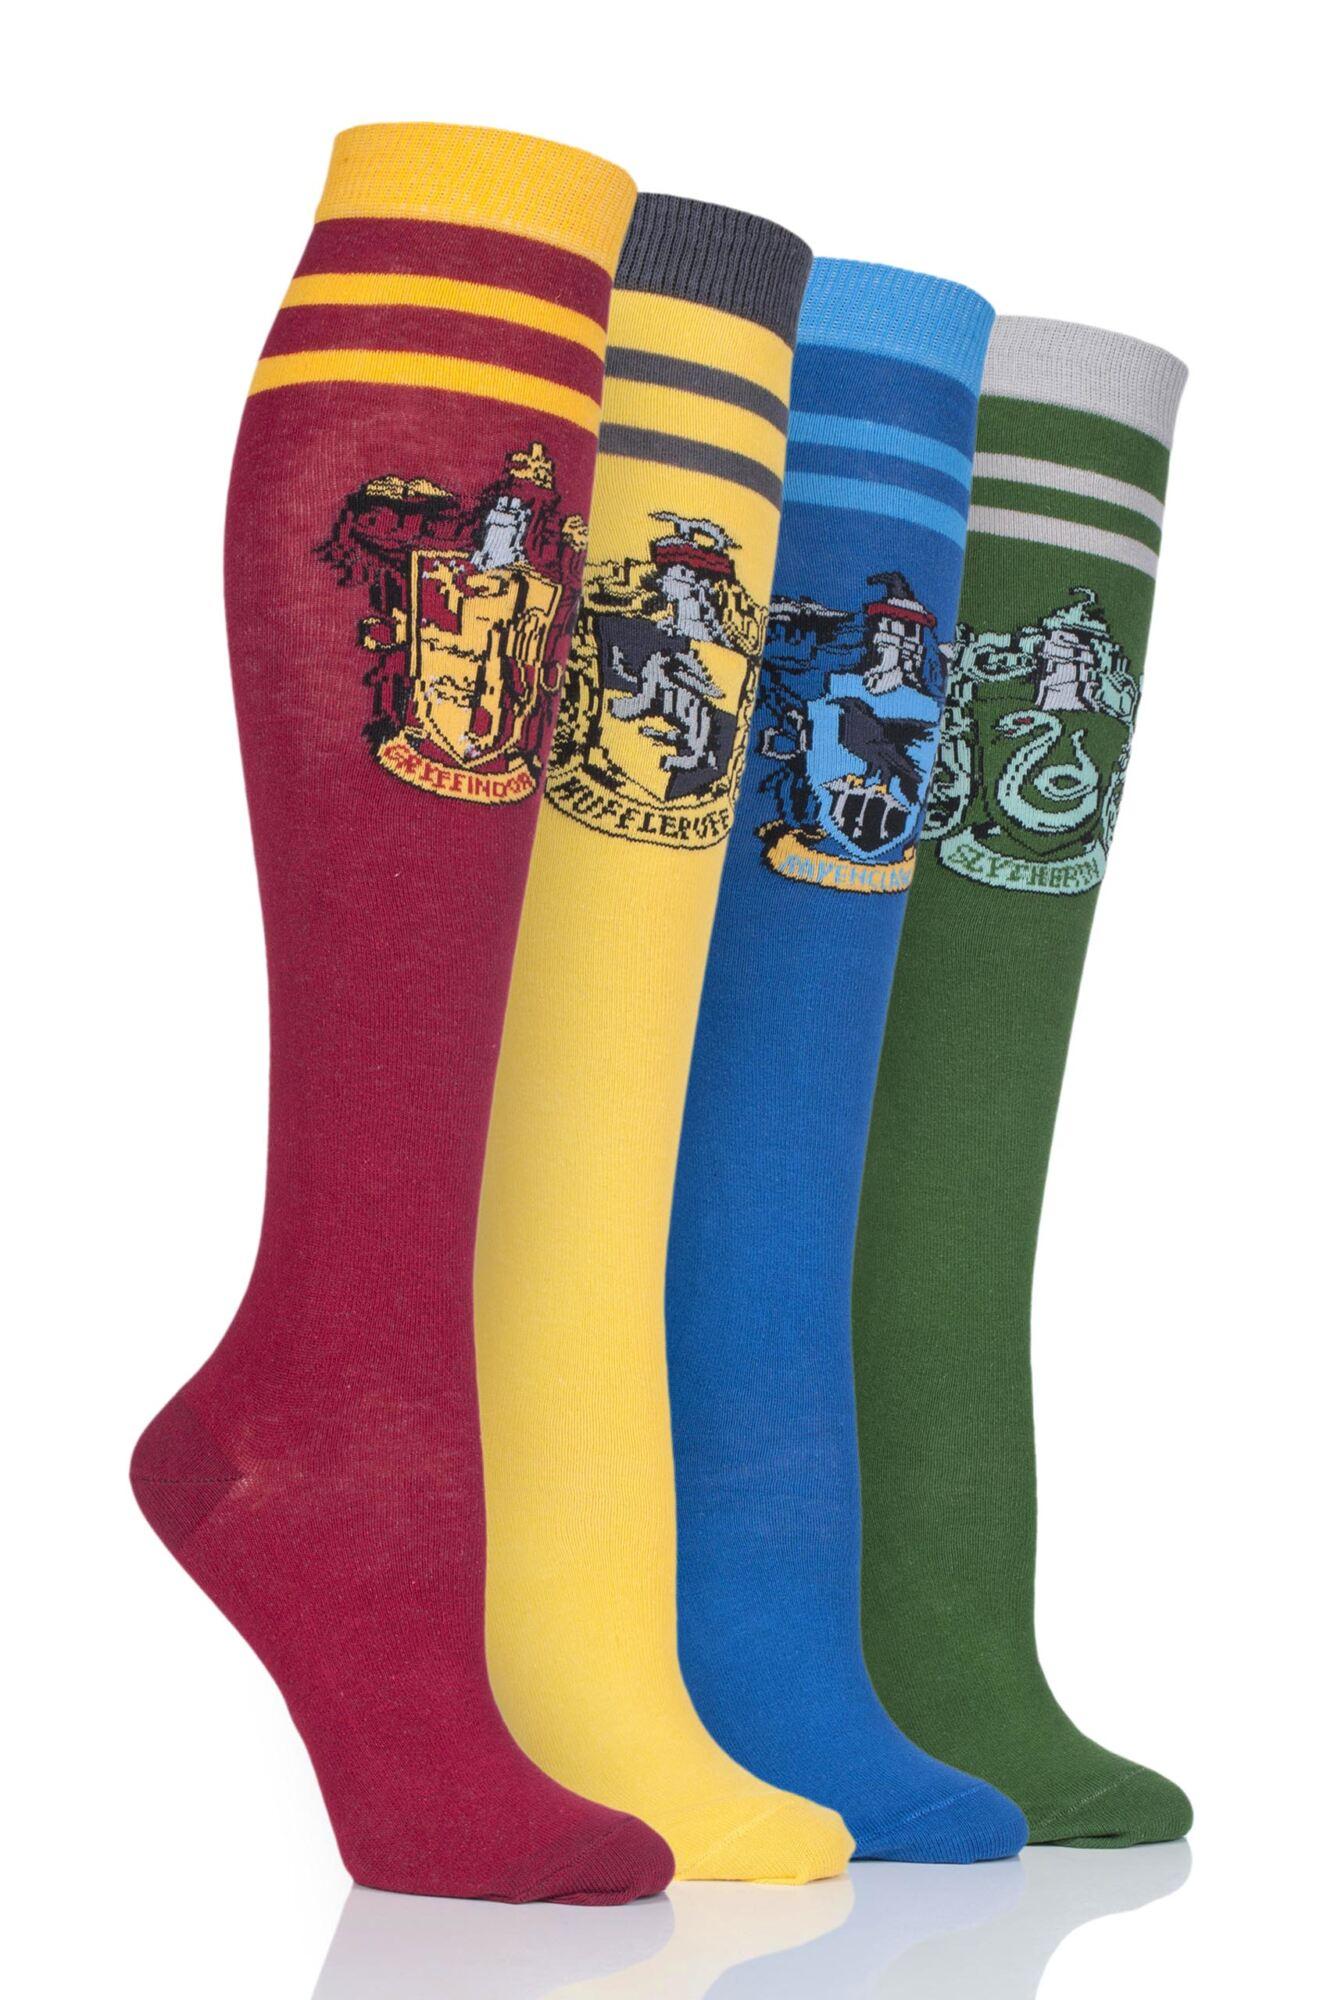 4 Pair Harry Potter House Badges Cotton Knee High Socks Ladies - Film & TV Characters